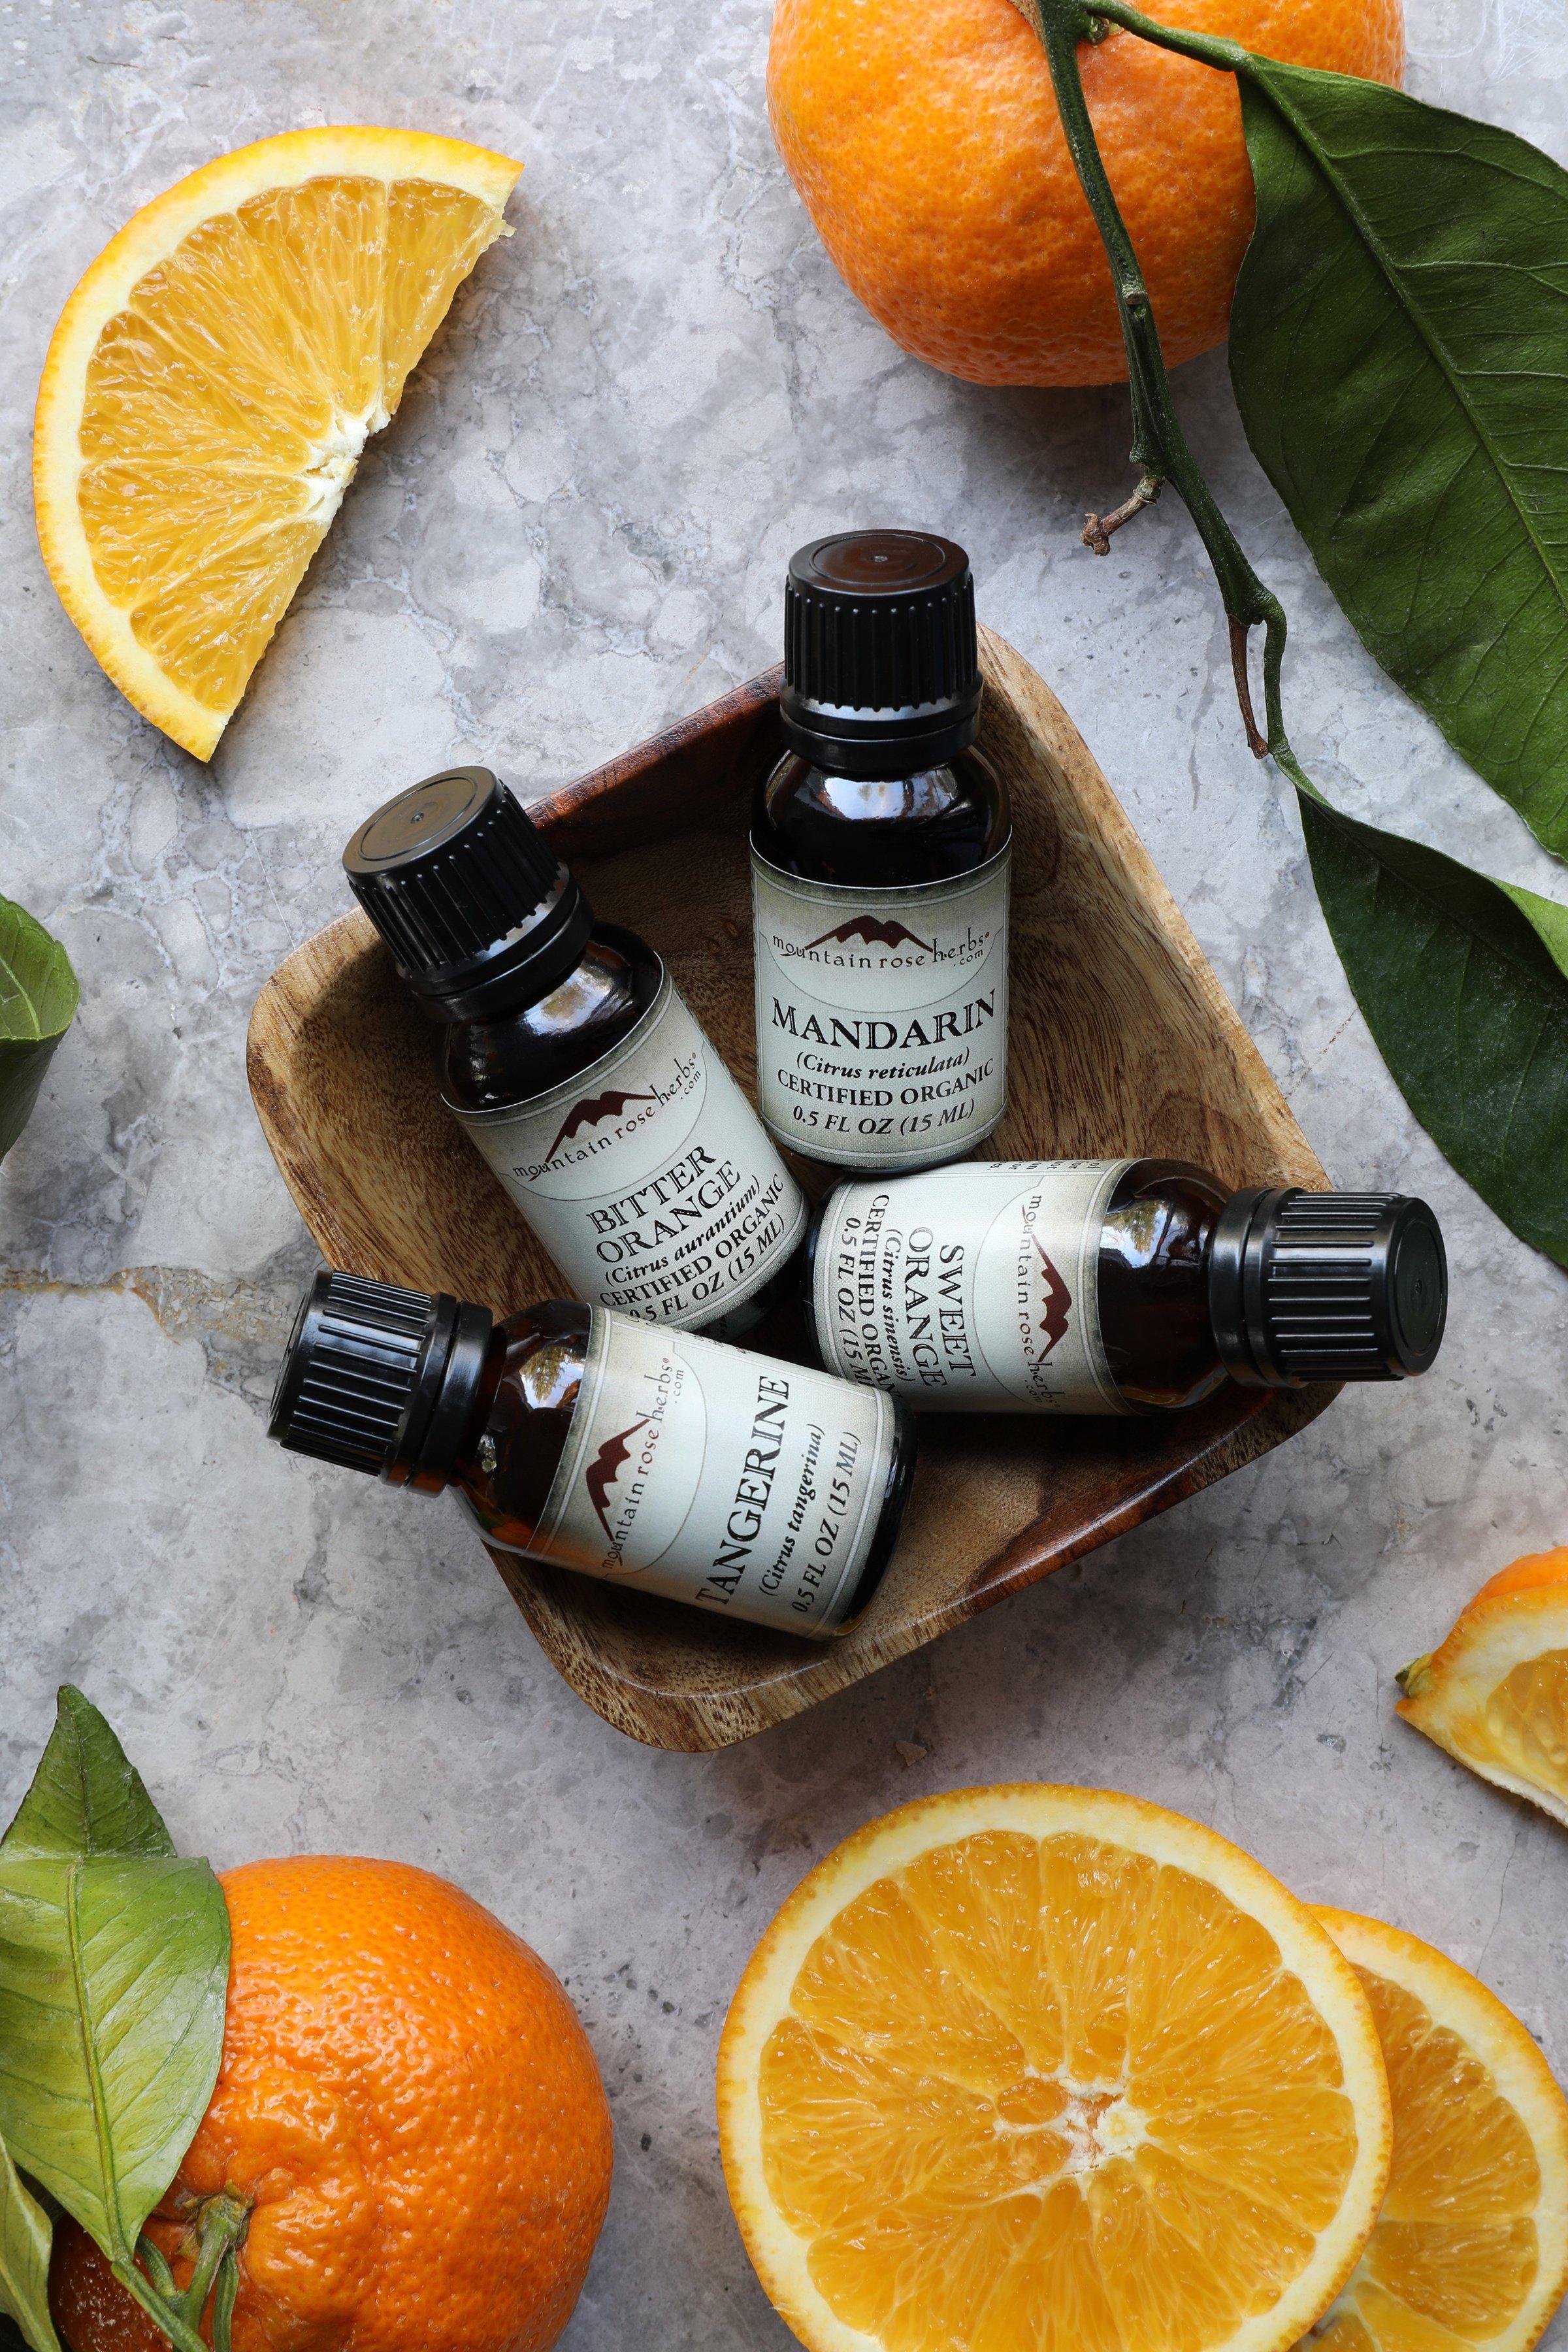 Mandarin essential oil, Sweet Orange essential oil, Bitter orange essential oil, and tangerine essential oil in a wooden bowl